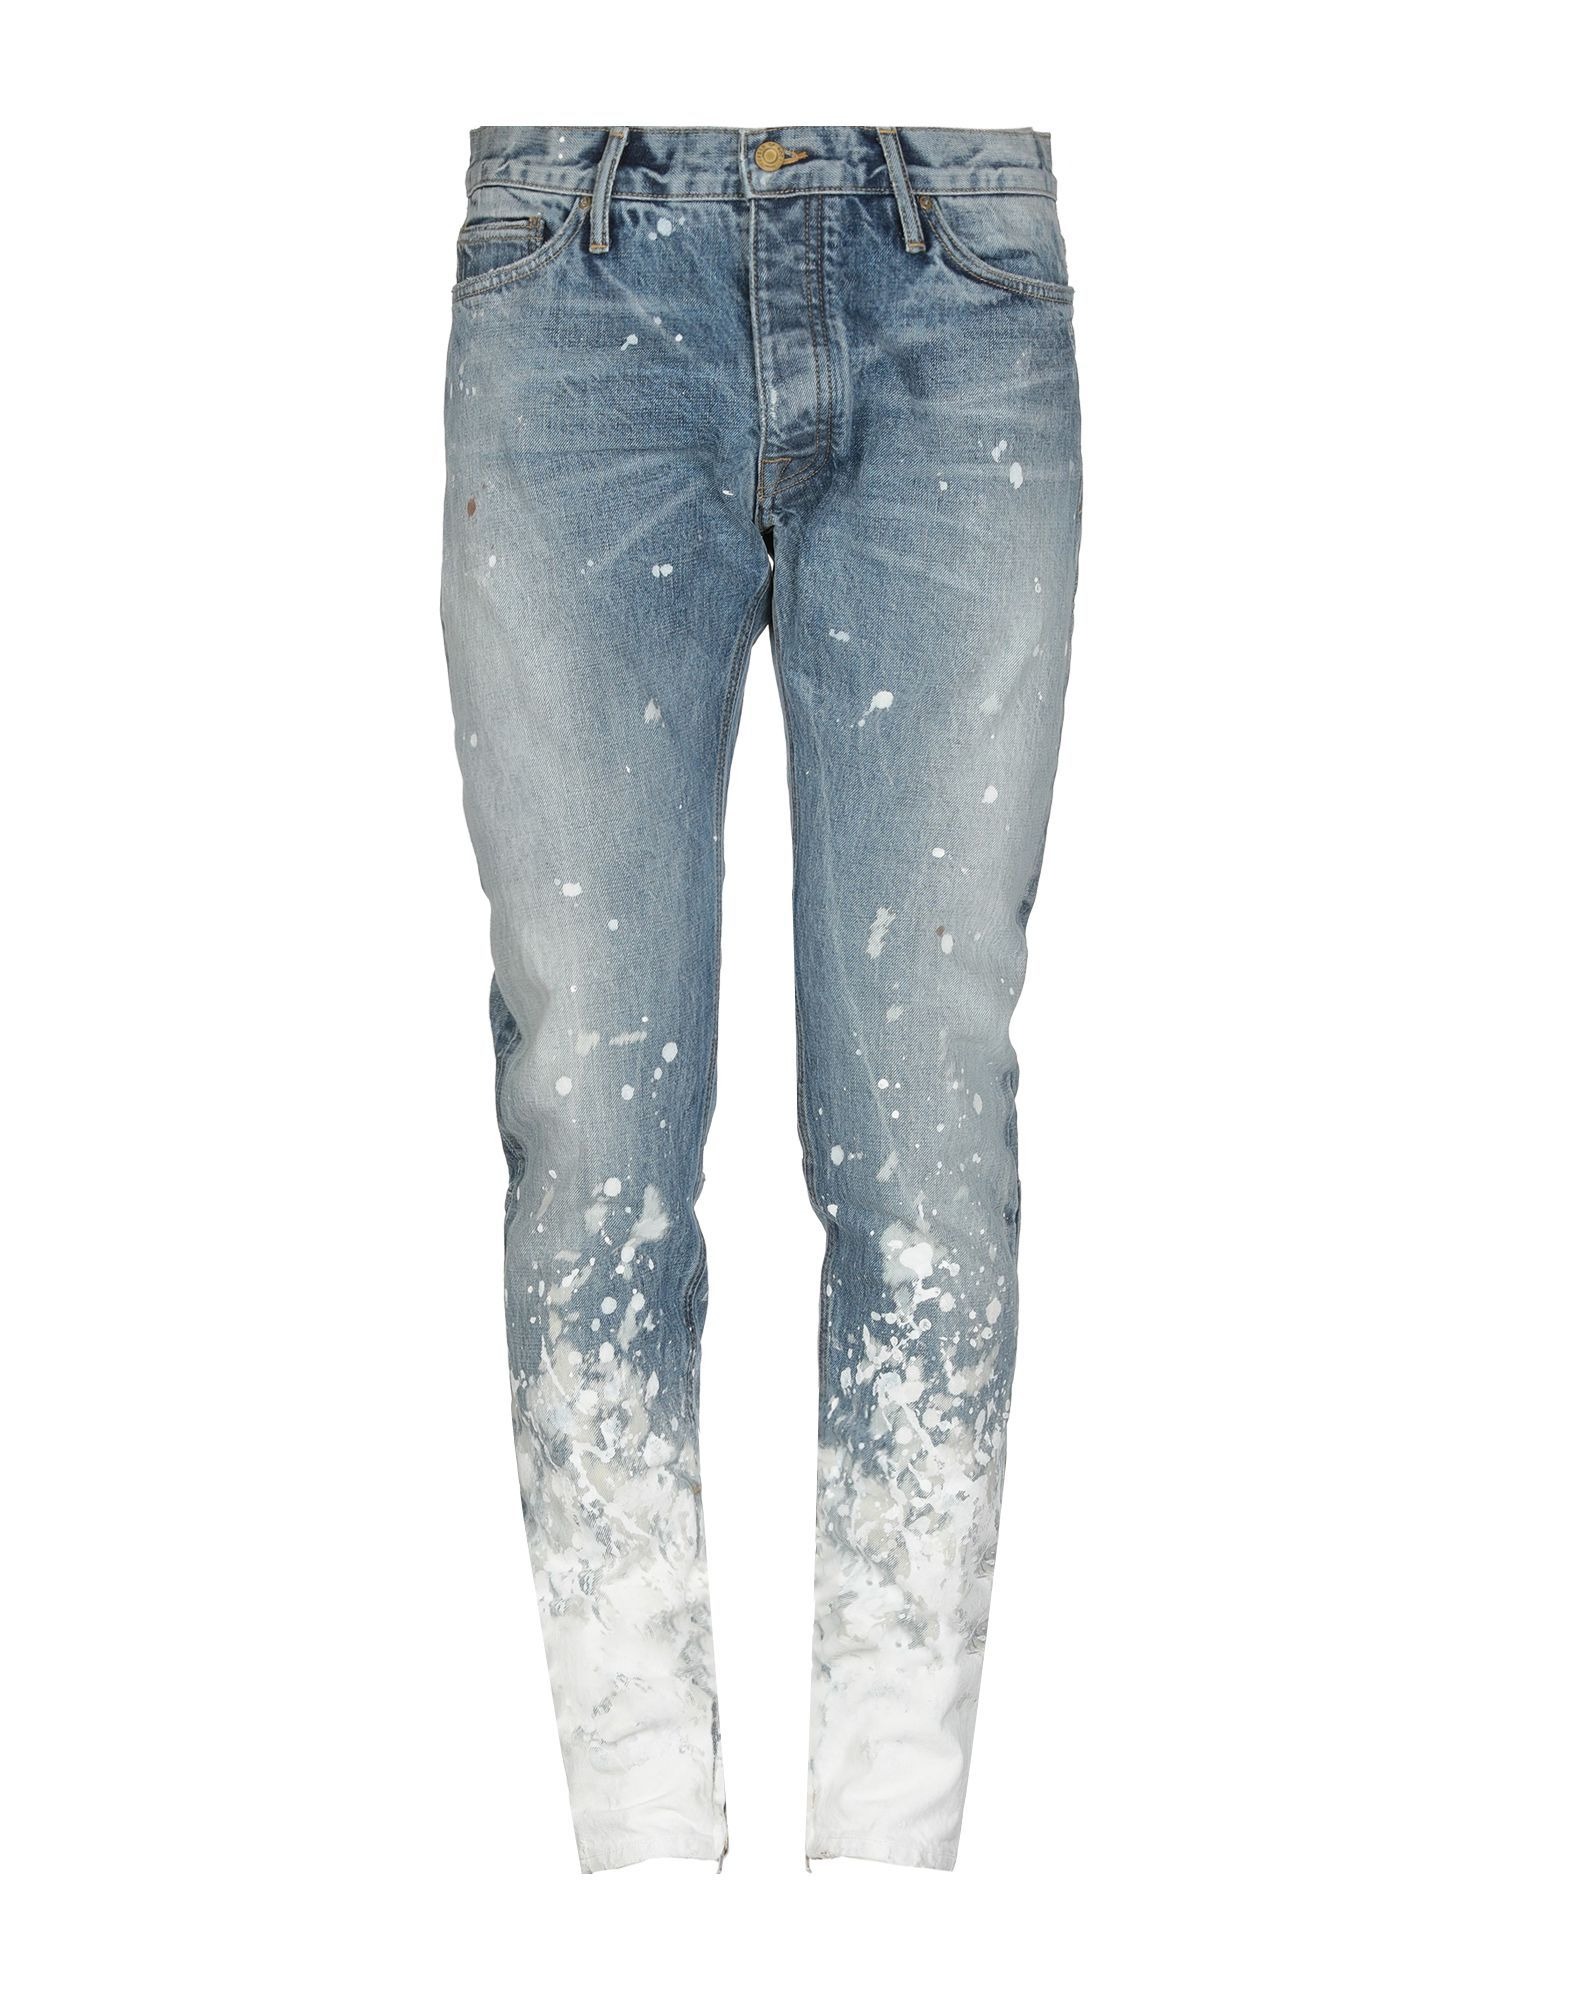 Denim Pants In Blue Straight Leg Pants Denim Pants Pants